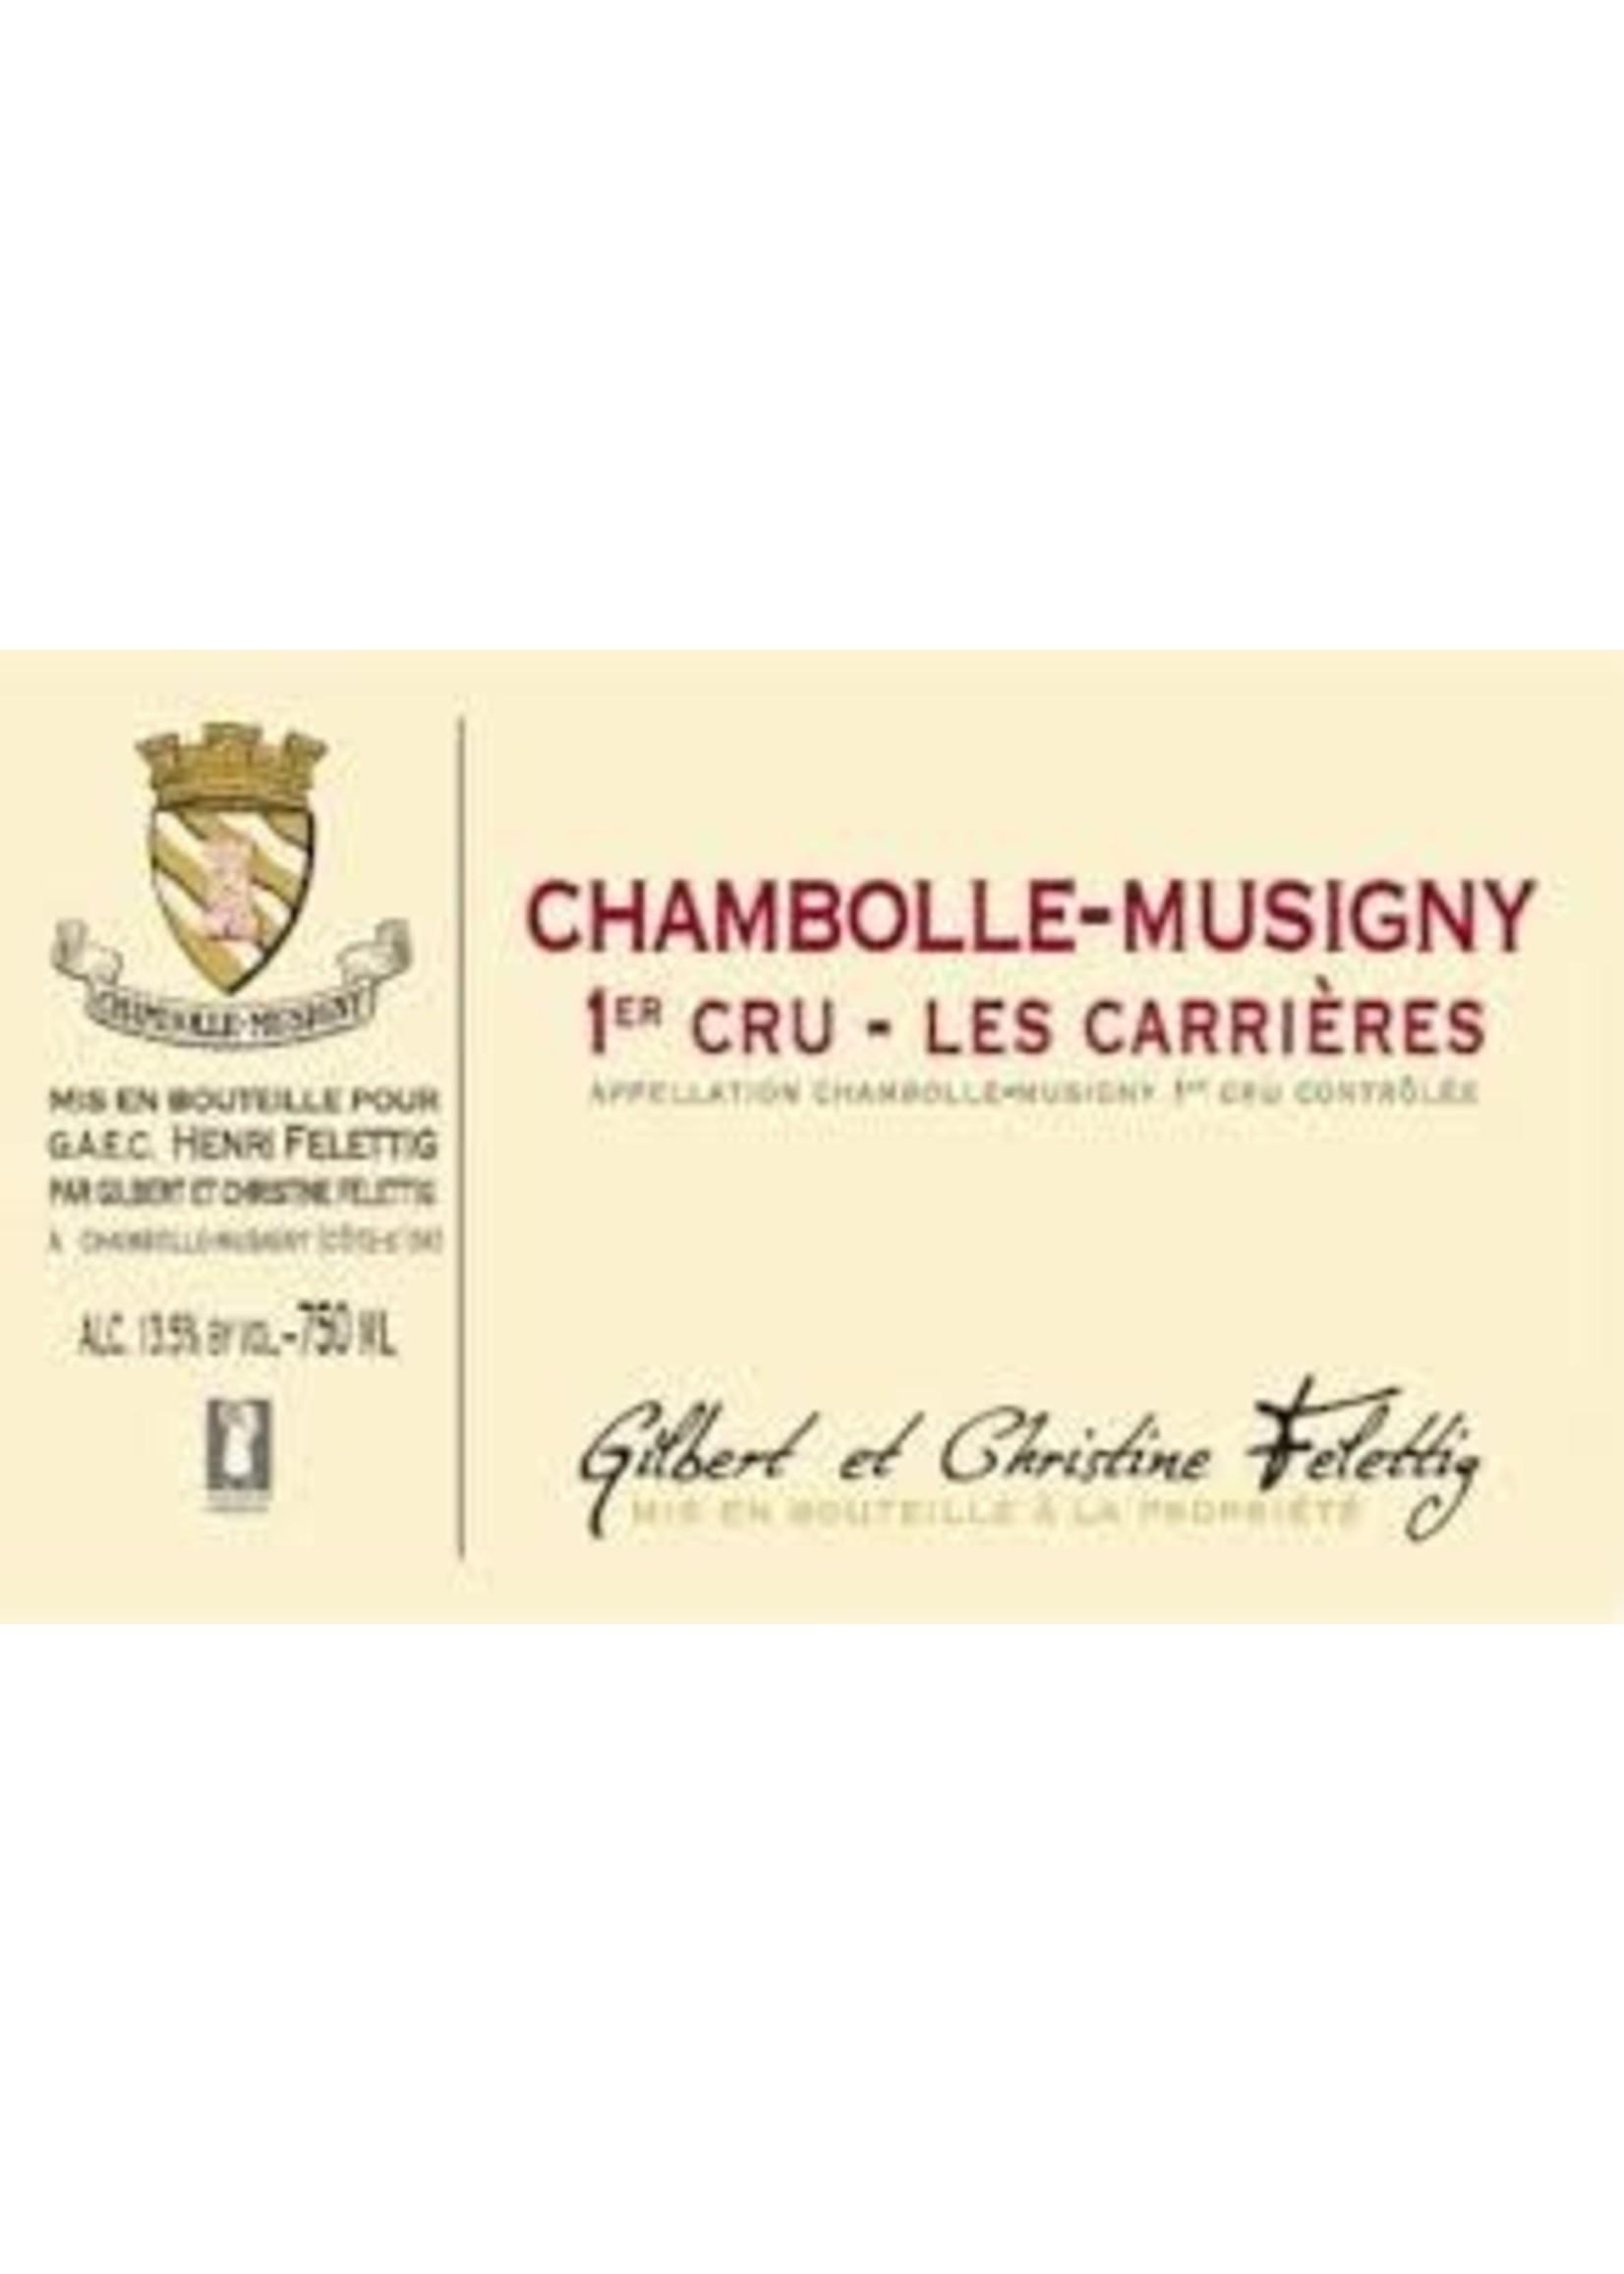 Felettig 2017 Chambolle-Musigny 1er Cru Les Carrieres 750ml